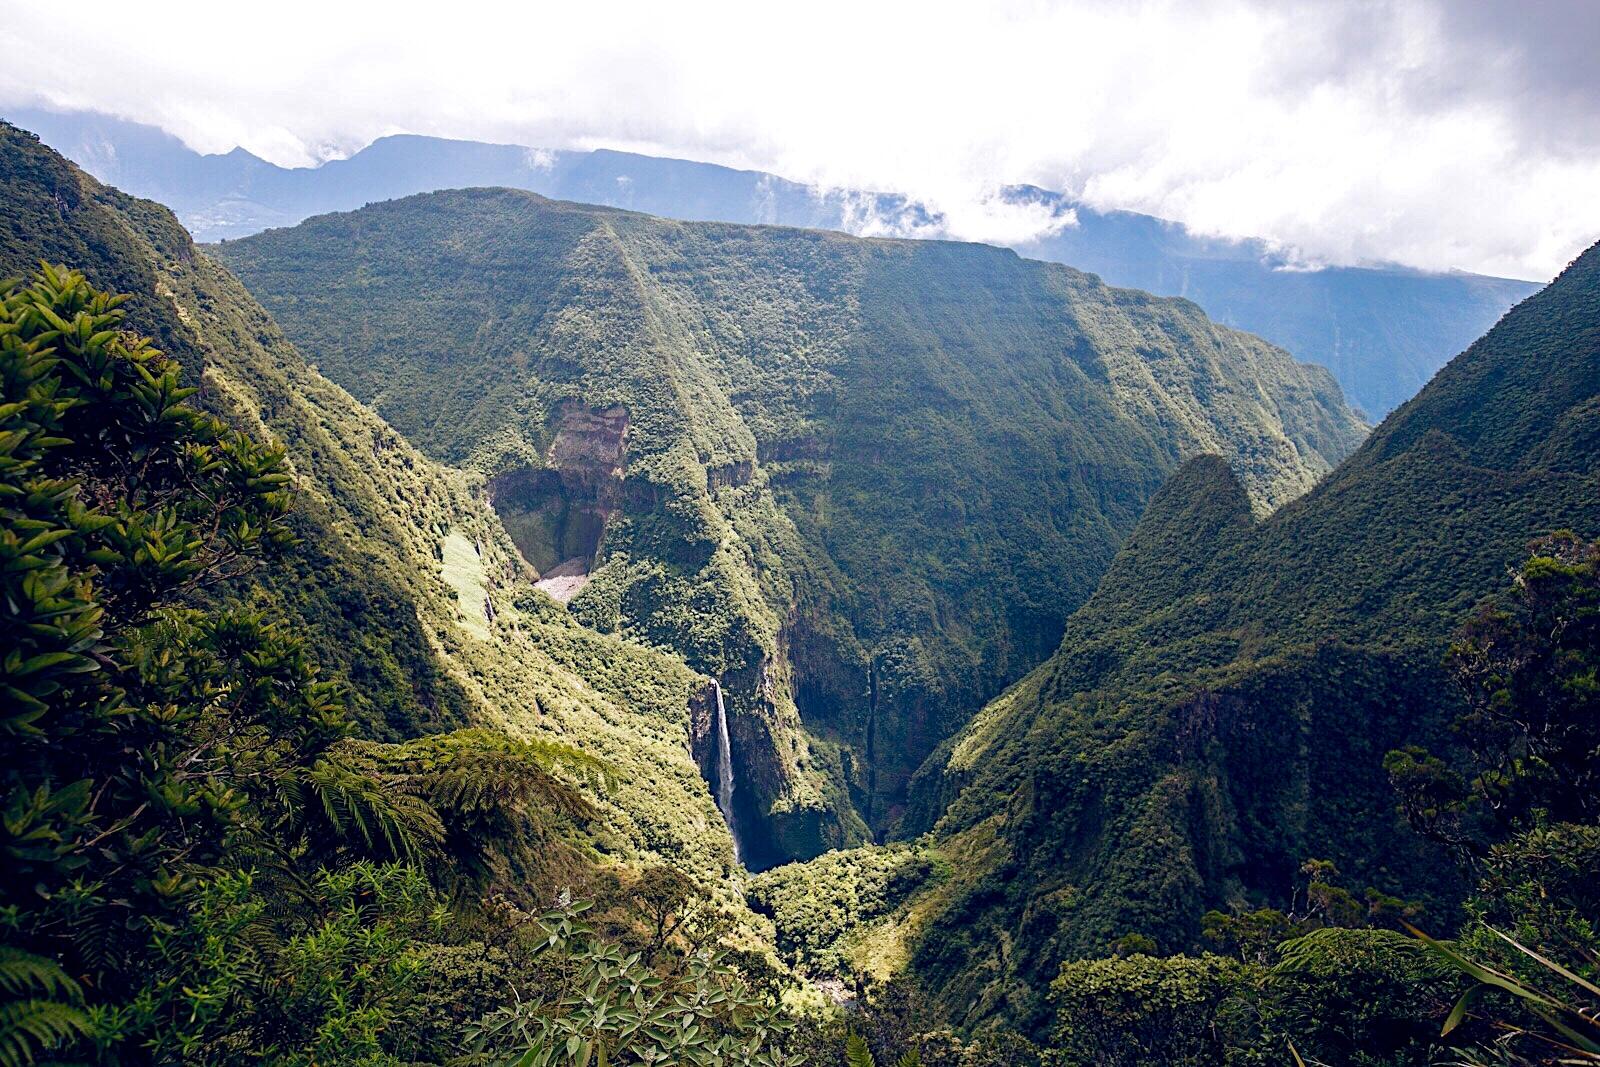 Trou de Fer Wanderung, La Réunion Sehenswürdigkeiten, La Réunion Highlights